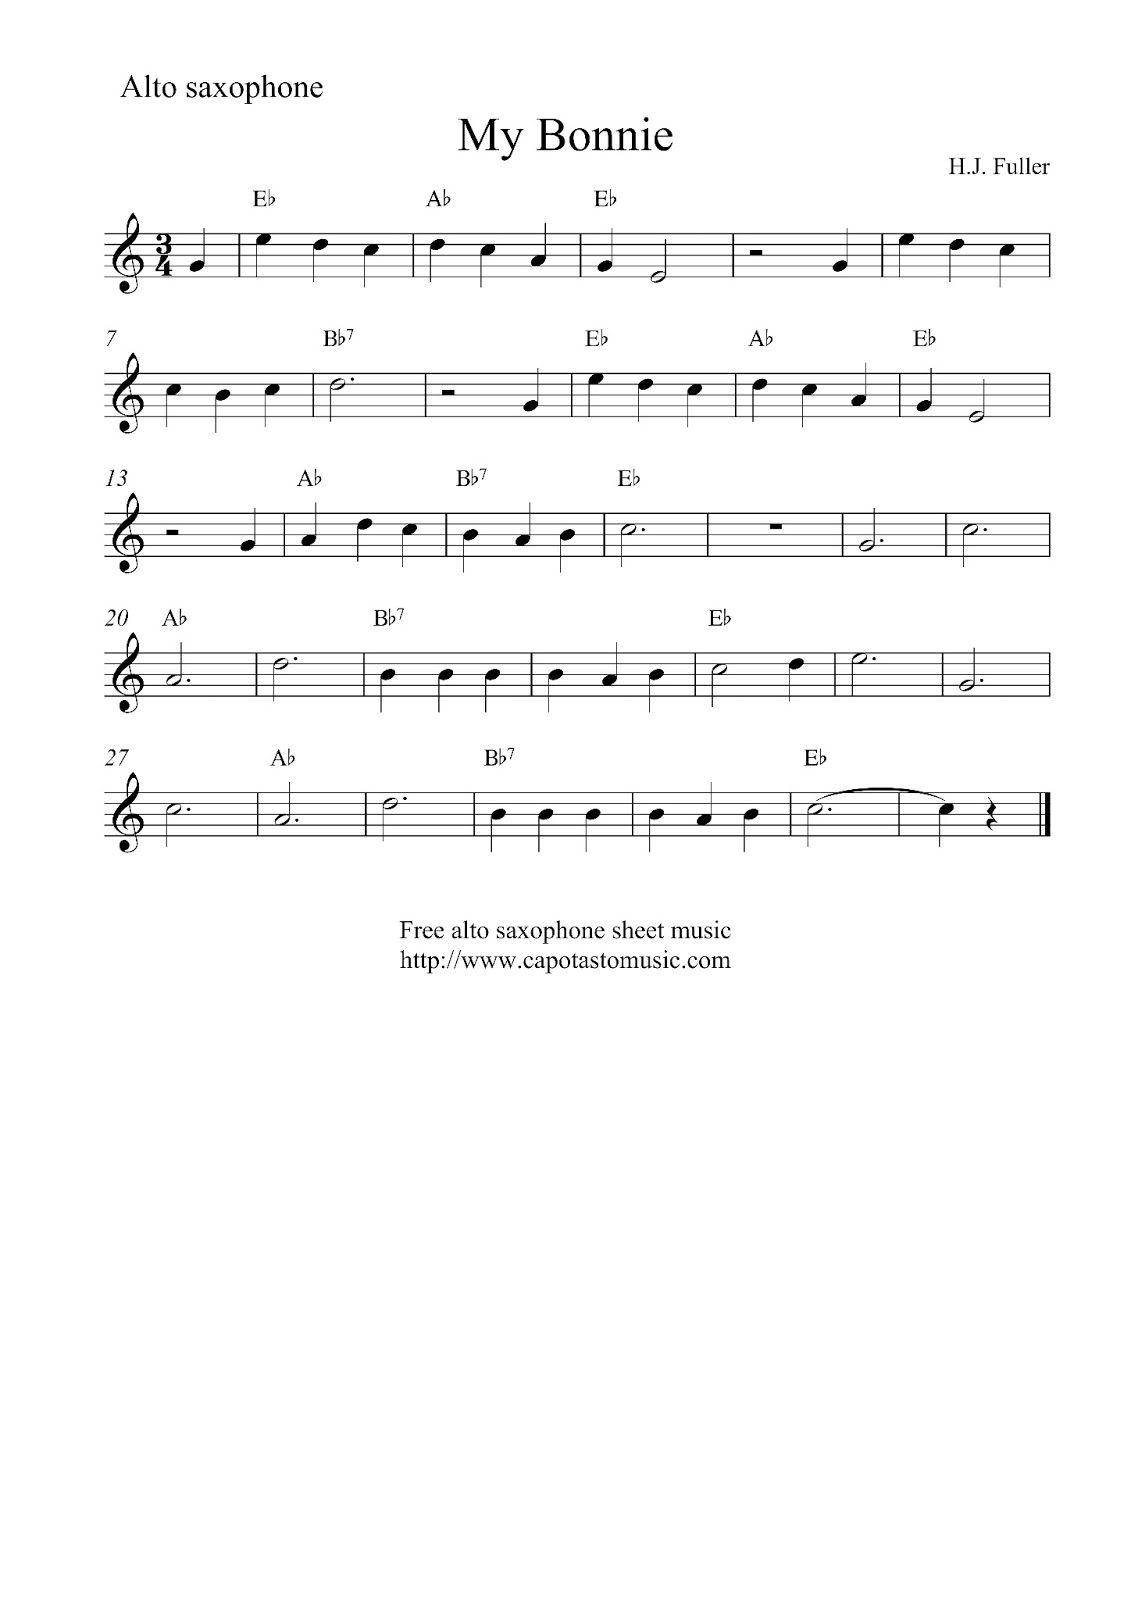 Alto Sax Easy Songs    Sheet Music Scores: Free Easy Alto - Free Printable Alto Saxophone Sheet Music